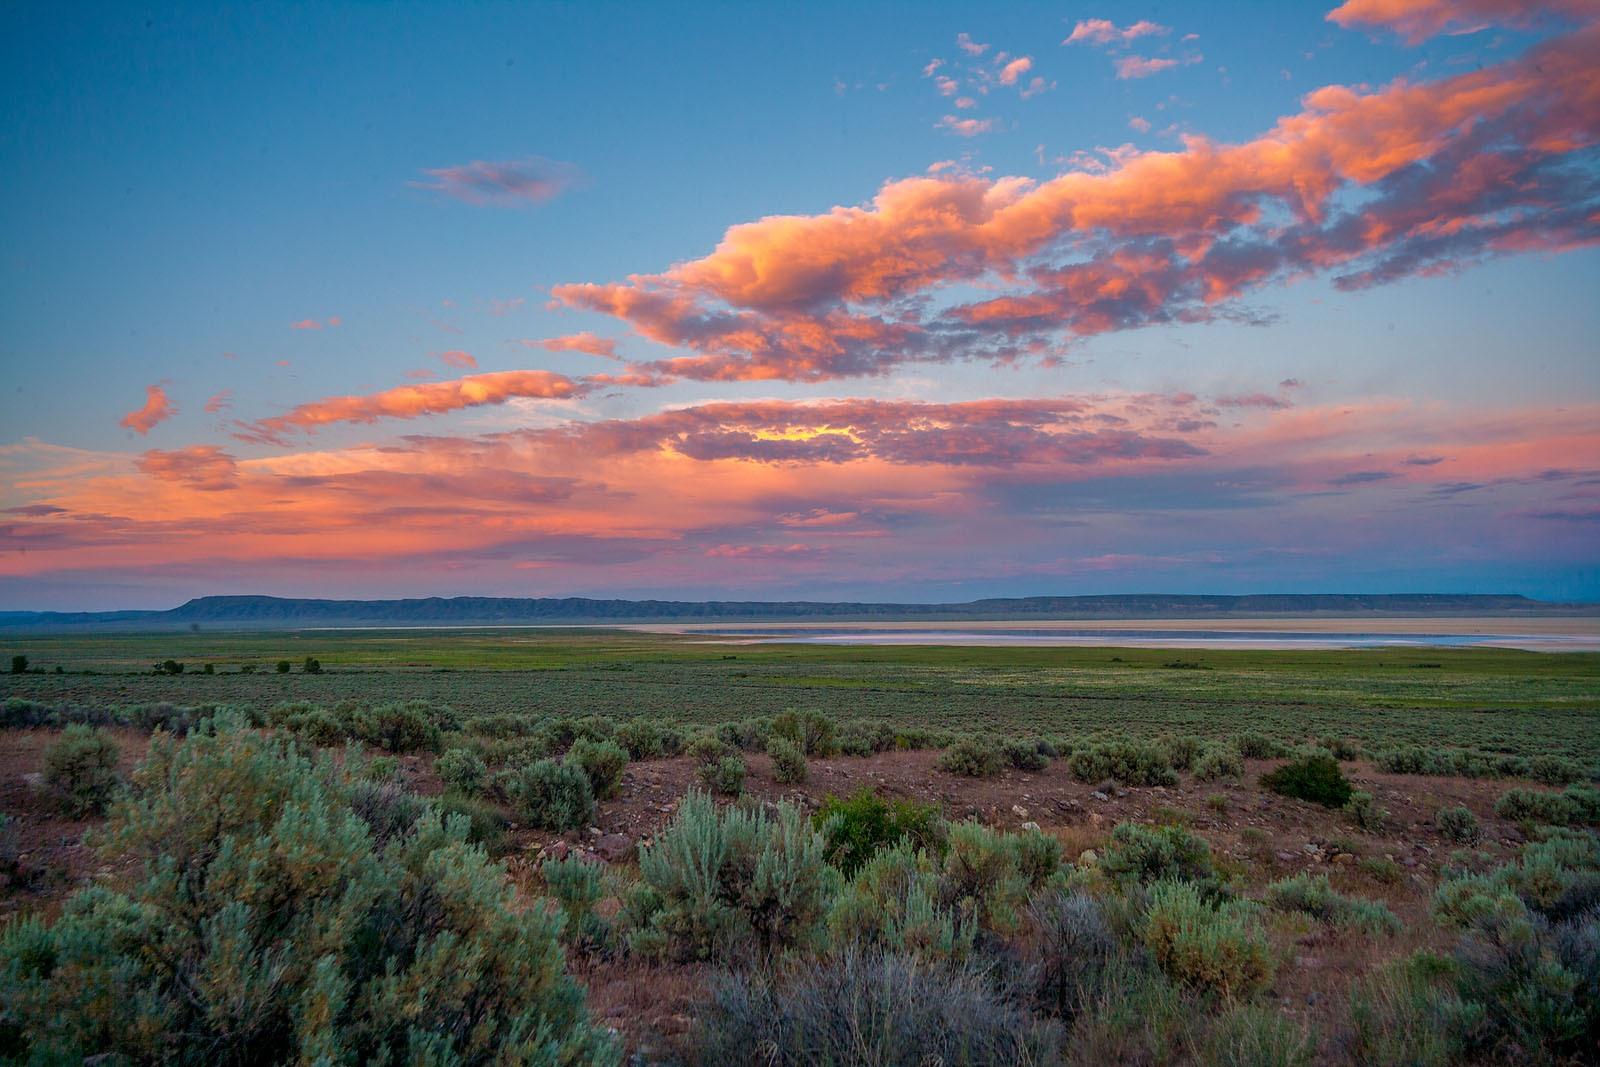 Bassett Scenic Landscape Vistas VQ4G3027